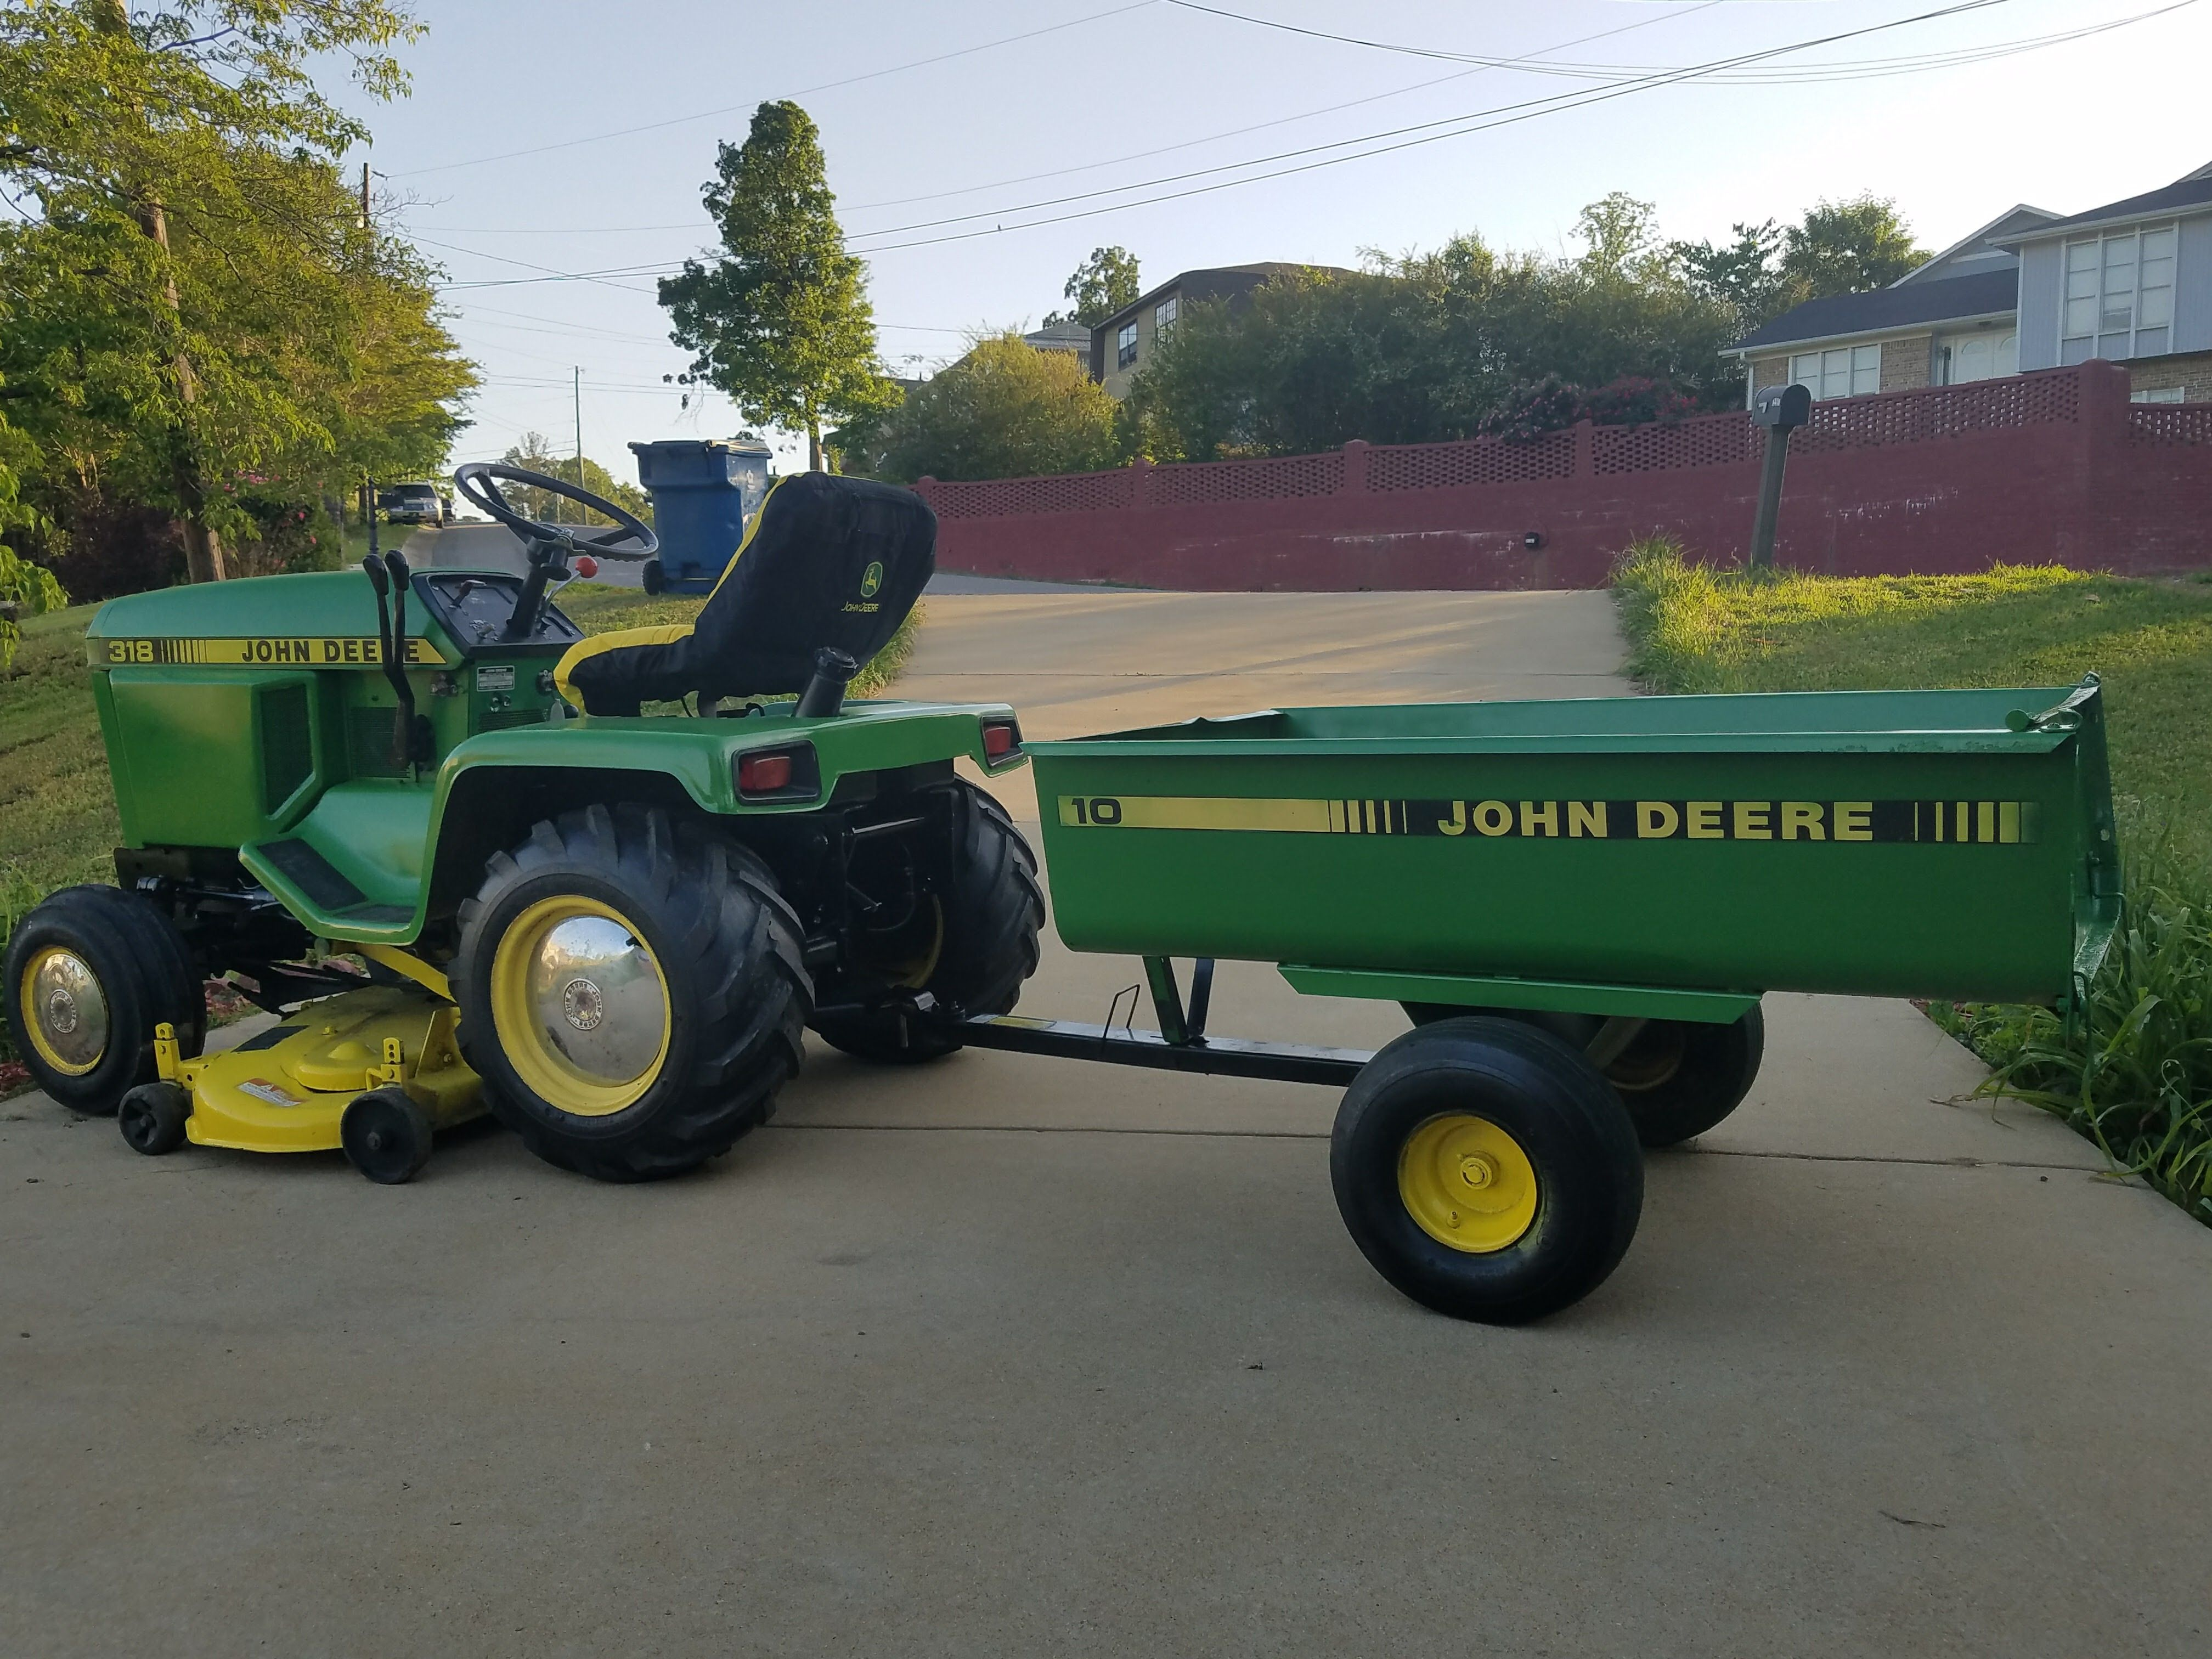 Pin on JOHN Deere lawn and garden tractors